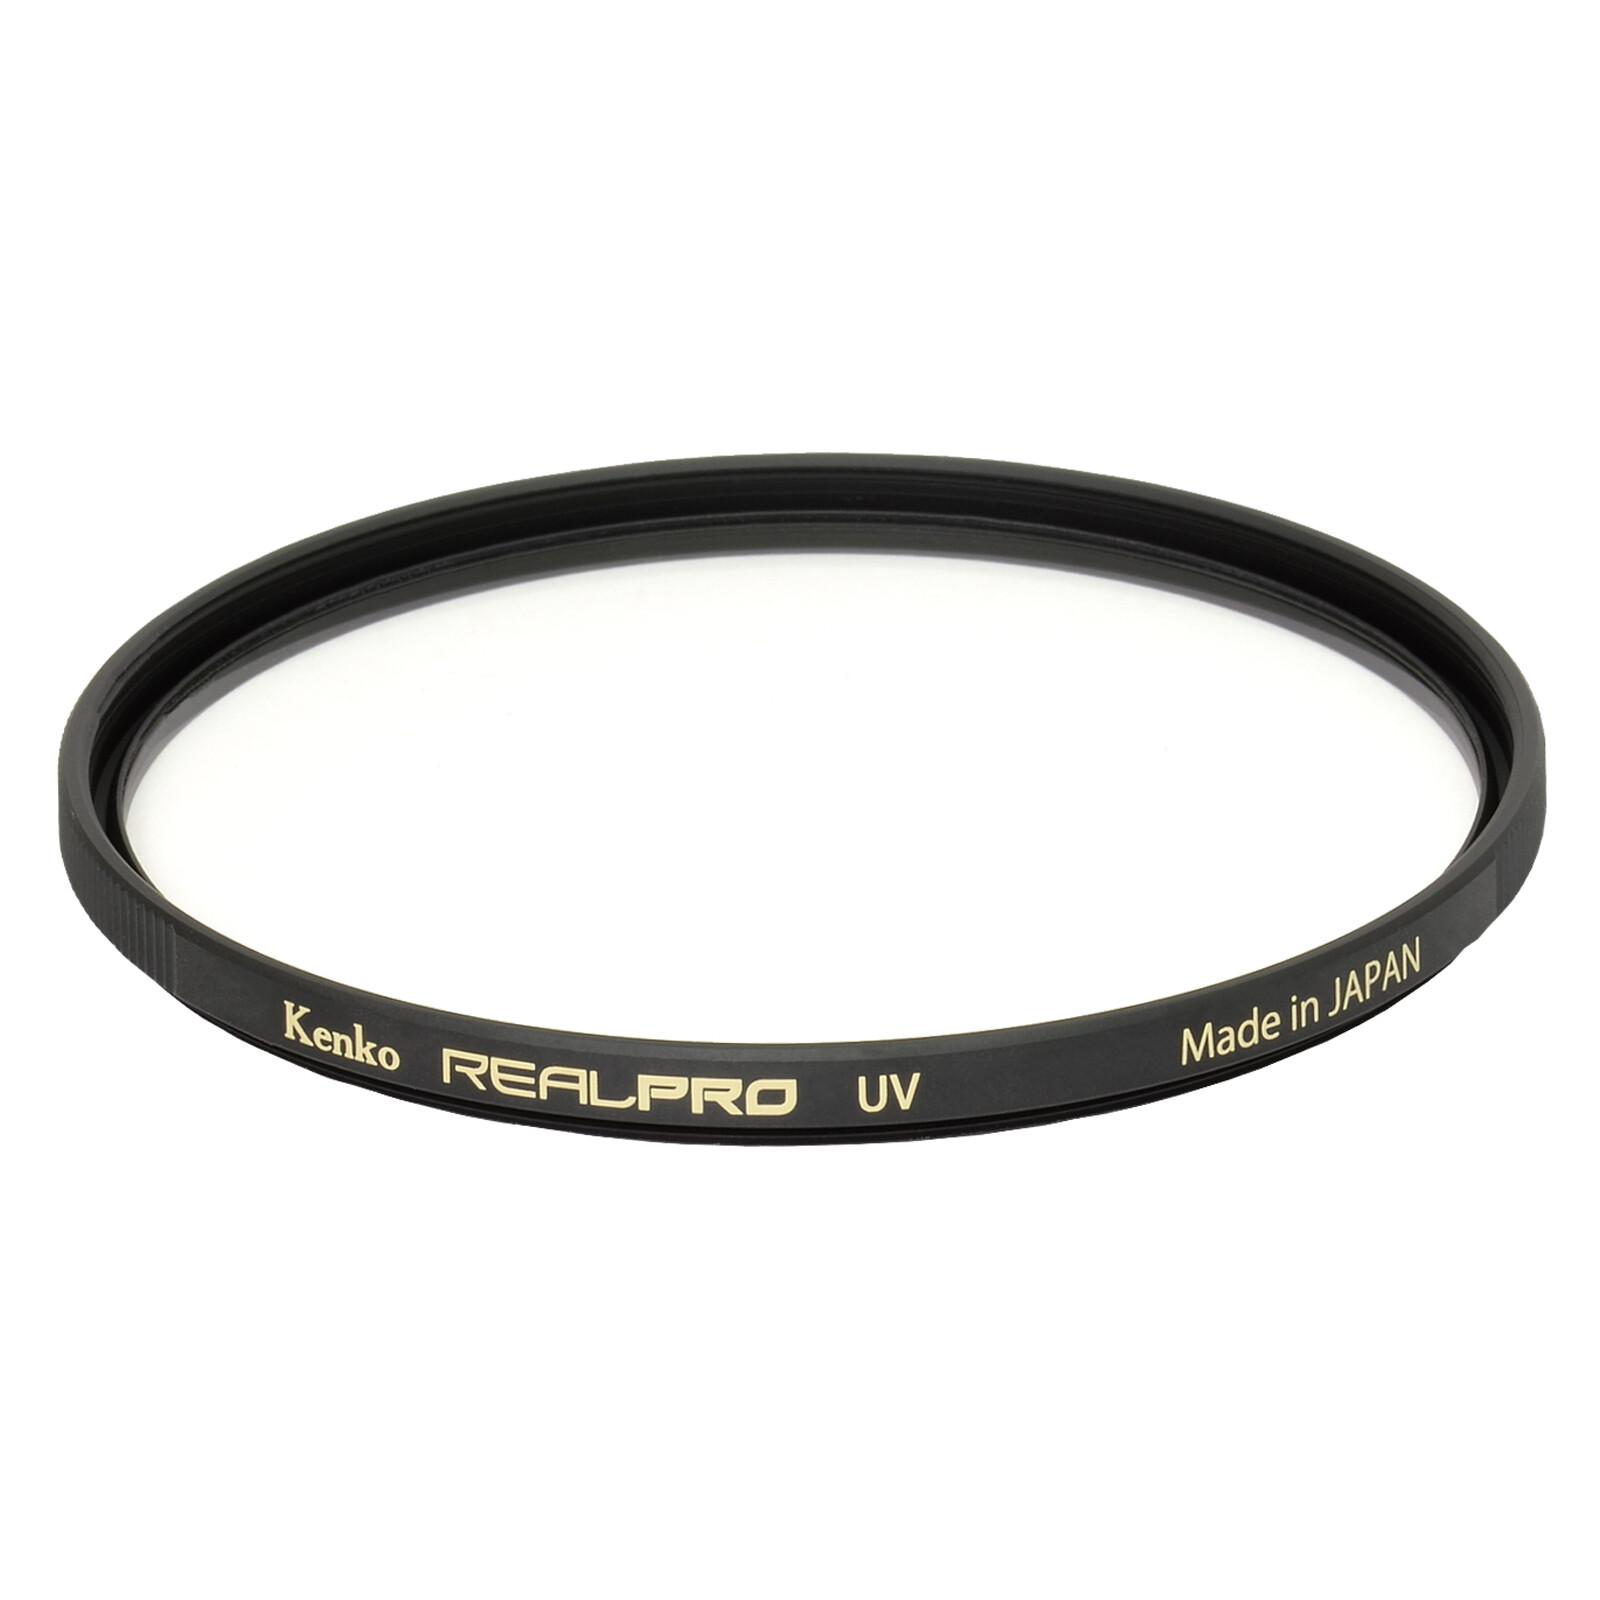 Kenko Real Pro UV 72mm Slim